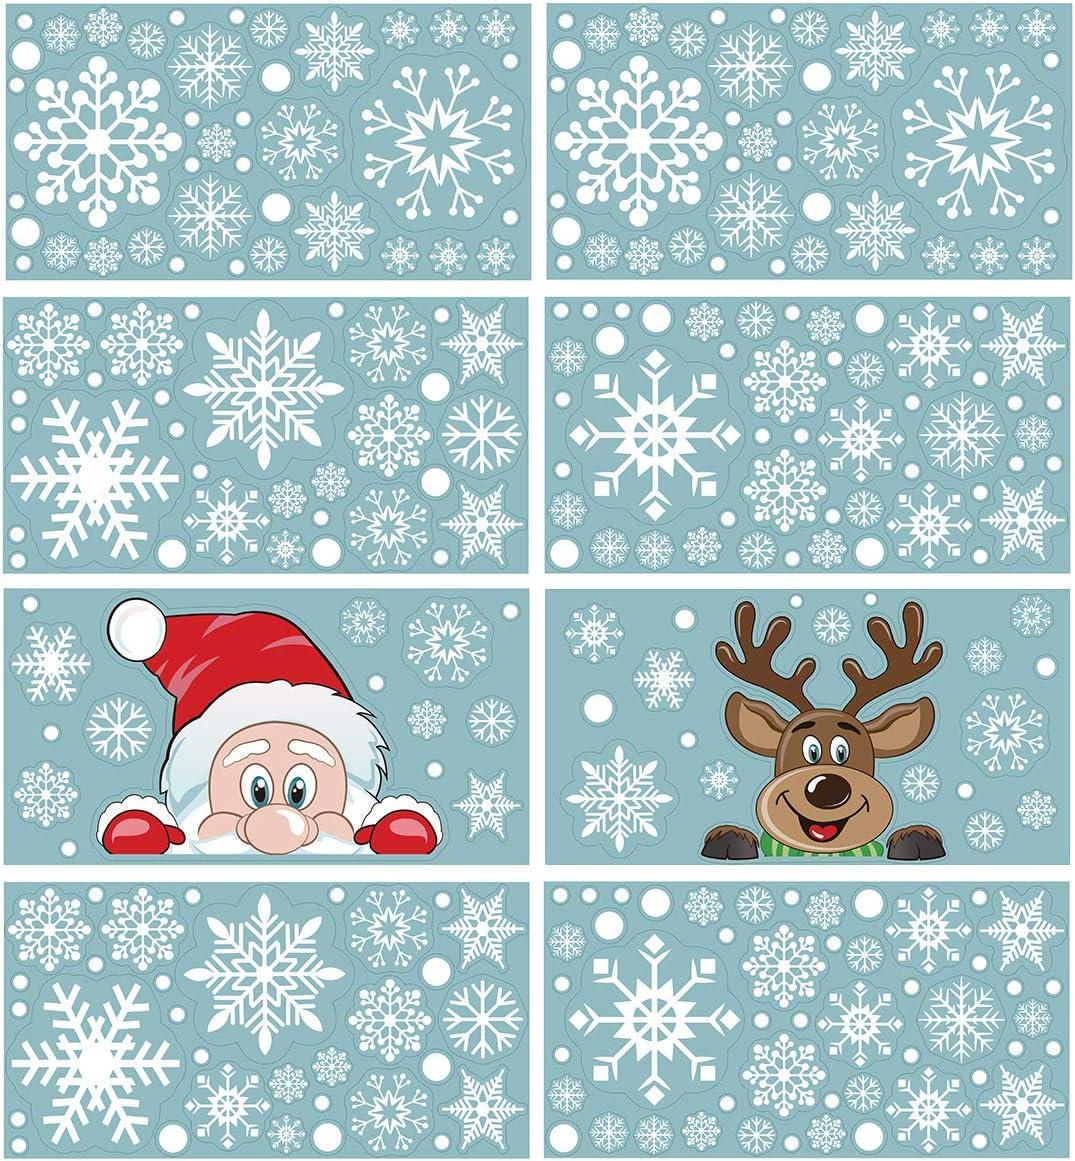 CCINEE Christmas Snowflake Window Cling Stickers